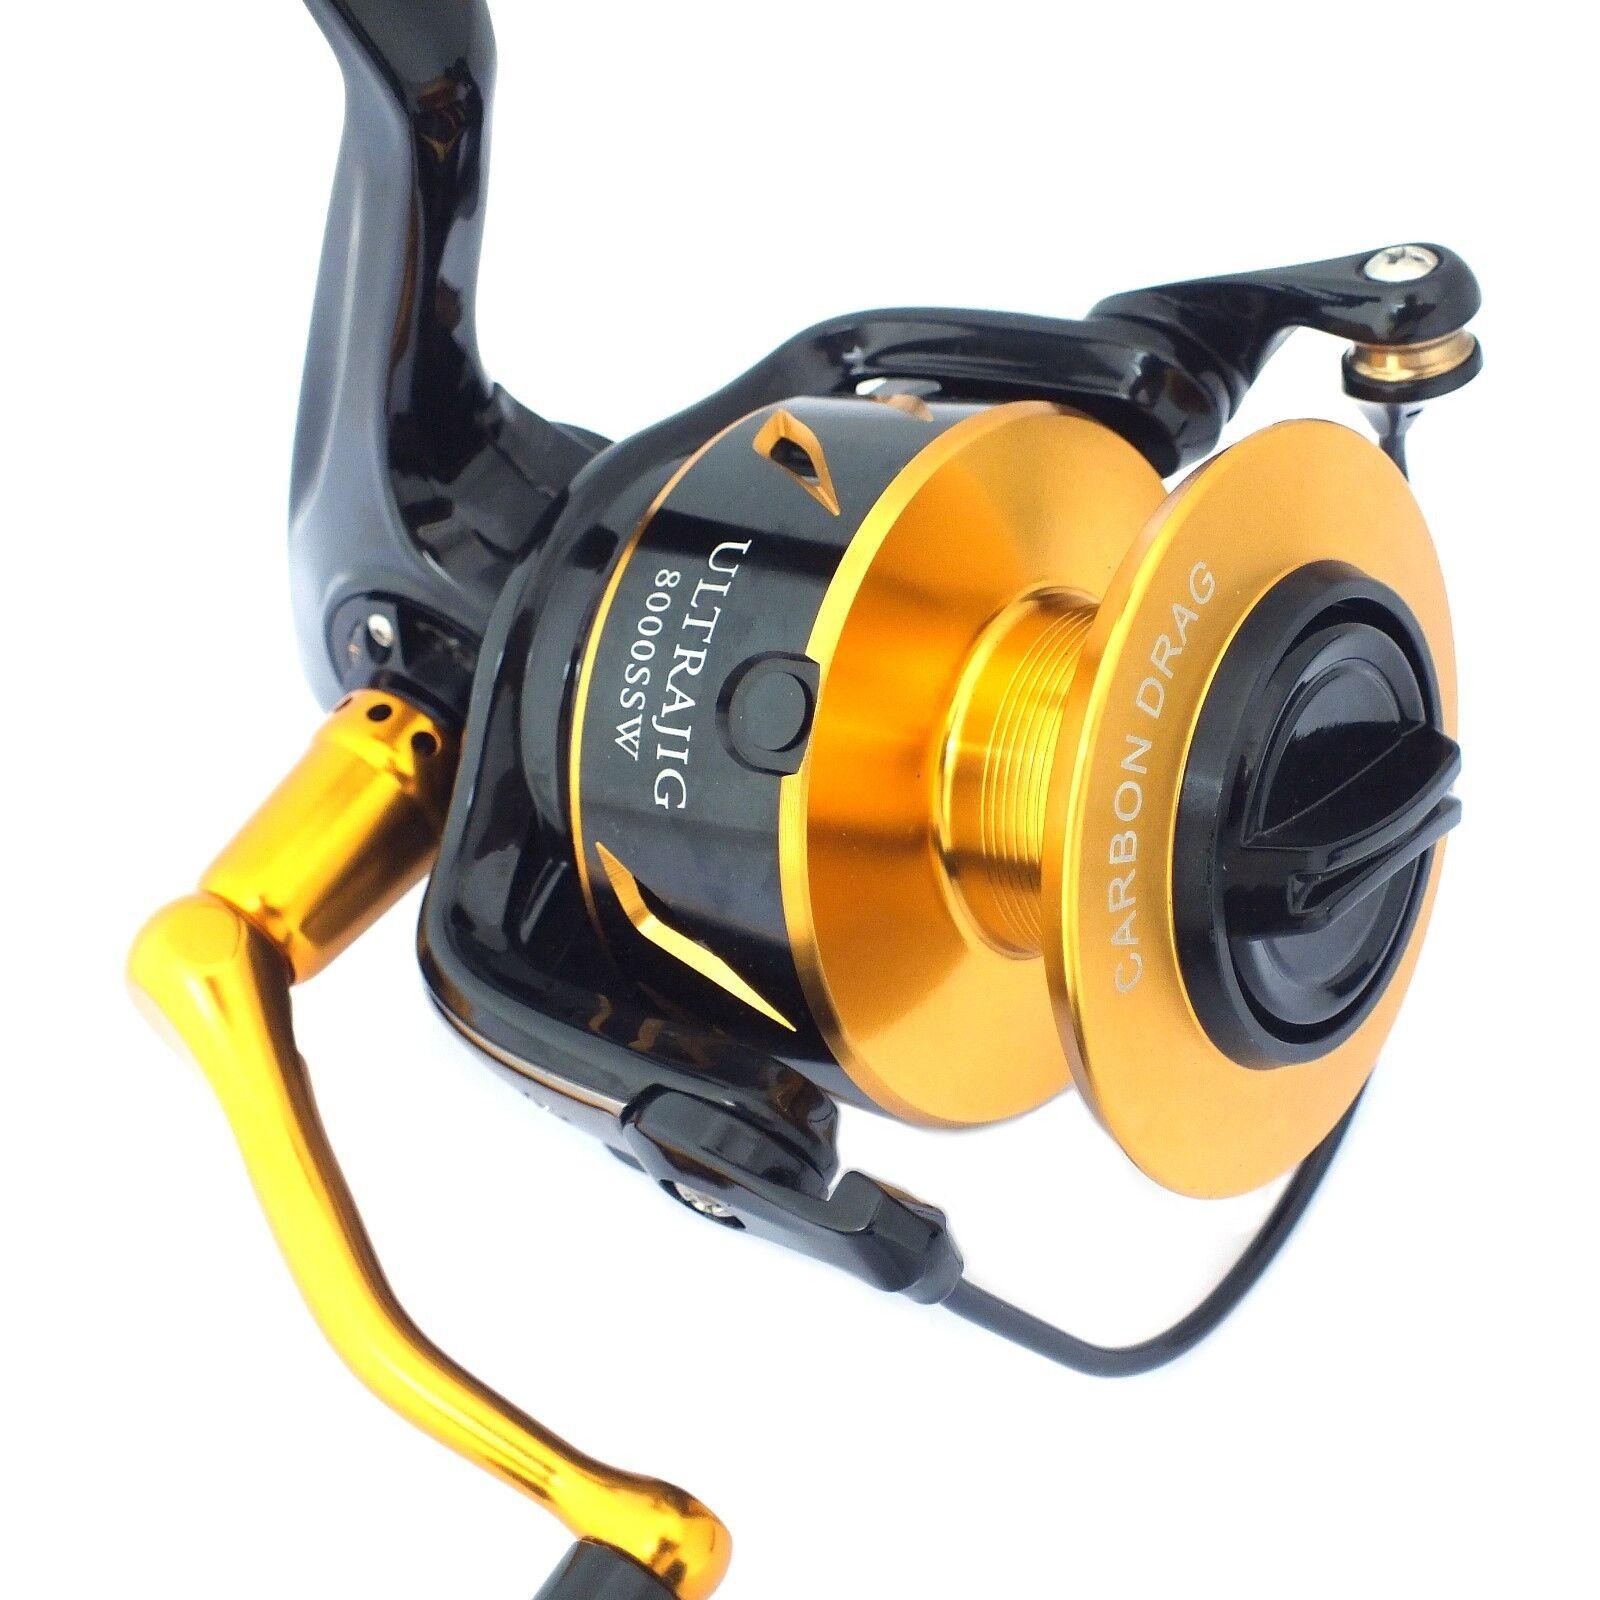 LureKiller Ultrajig 8000SSW Fishing Jig Spinning Reel Full Aluminium Carbon  Drag  new products novelty items